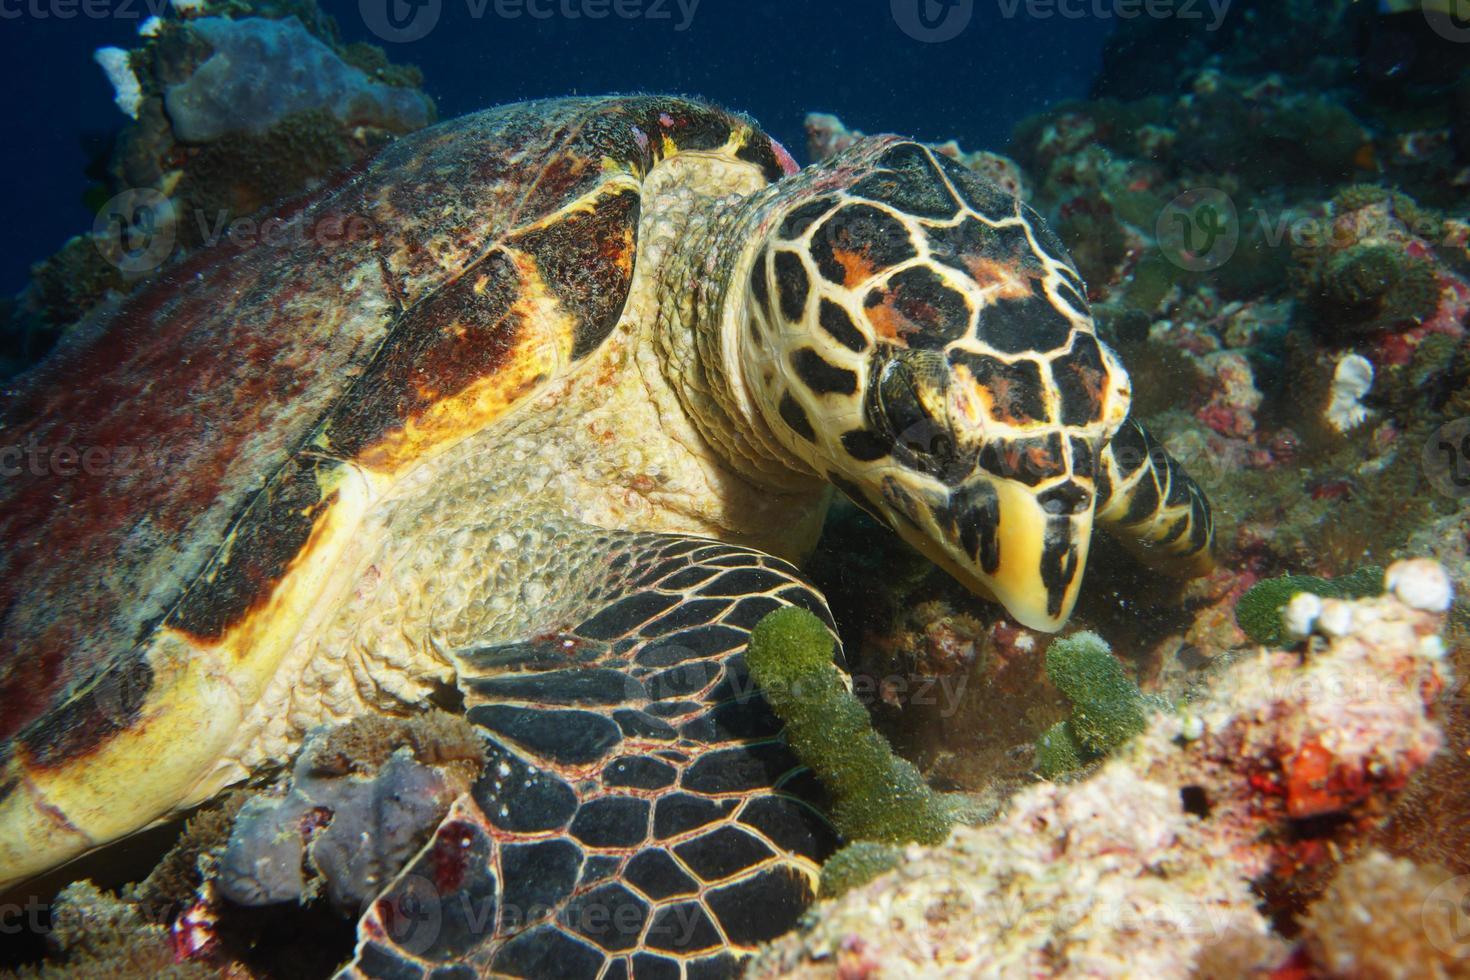 tartaruga-de-pente janta em algas no recife de maldivas foto